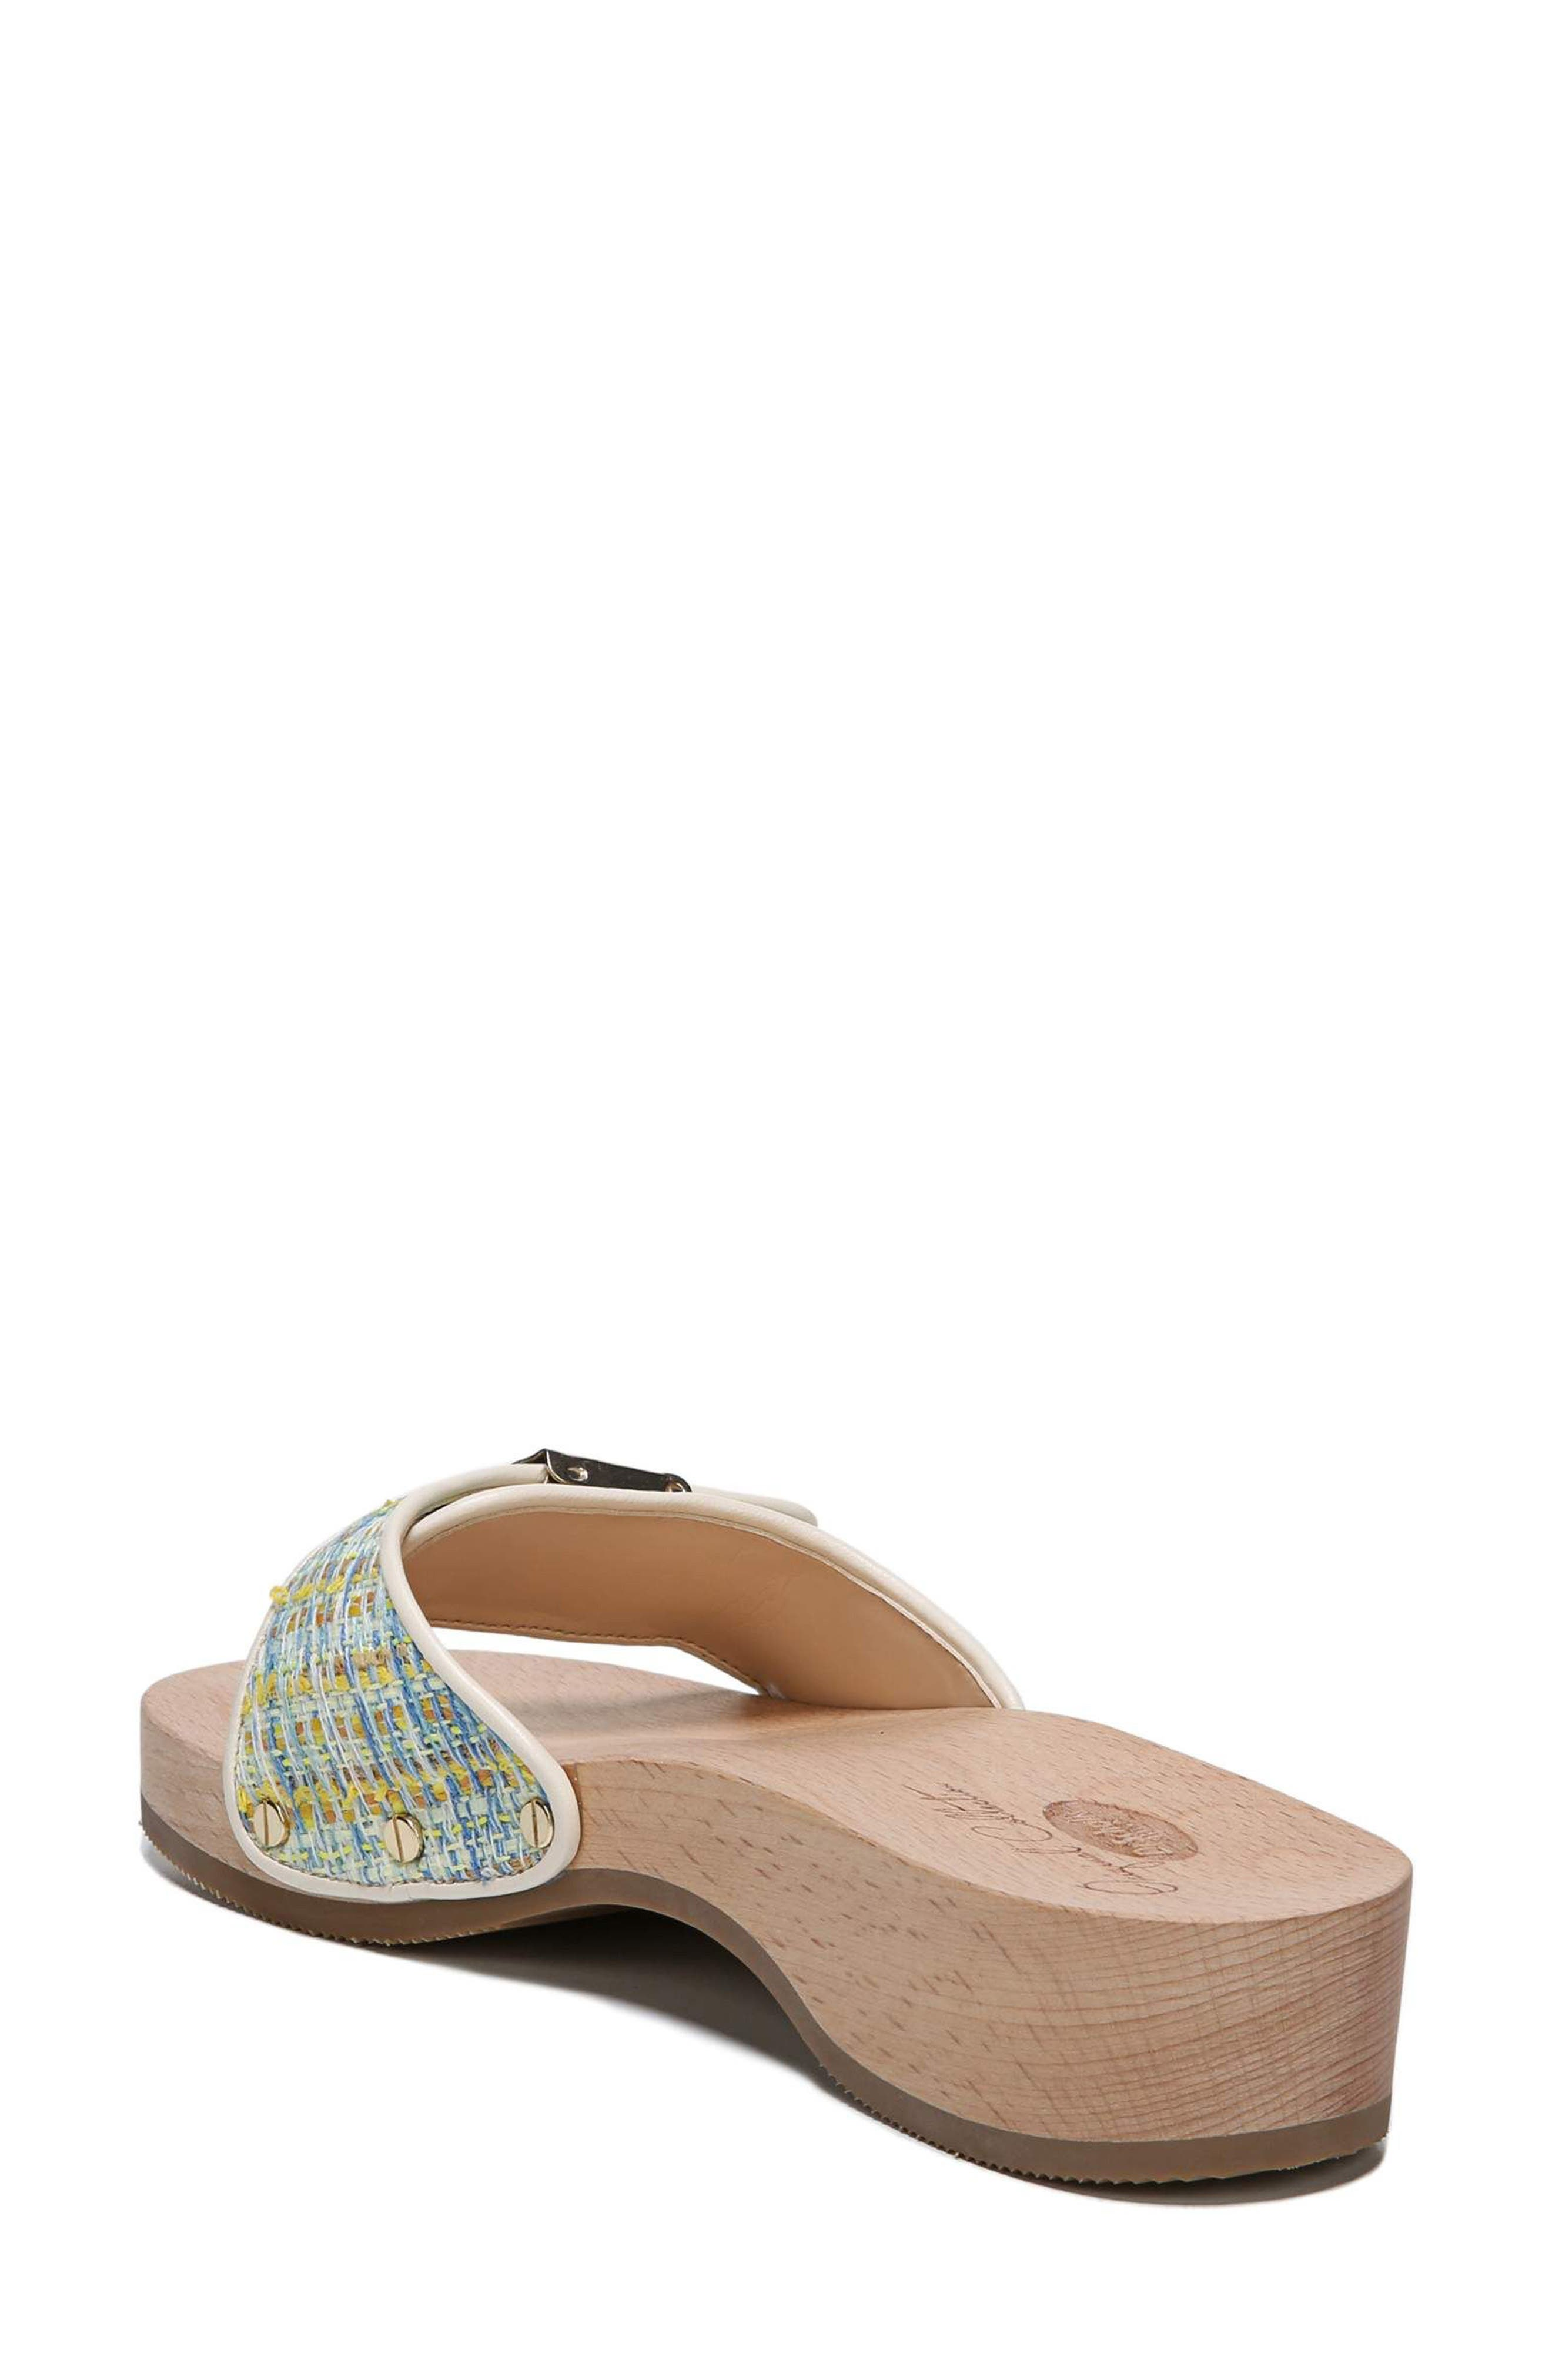 Alternate Image 2  - Dr. Scholl's Original Collection Sandal